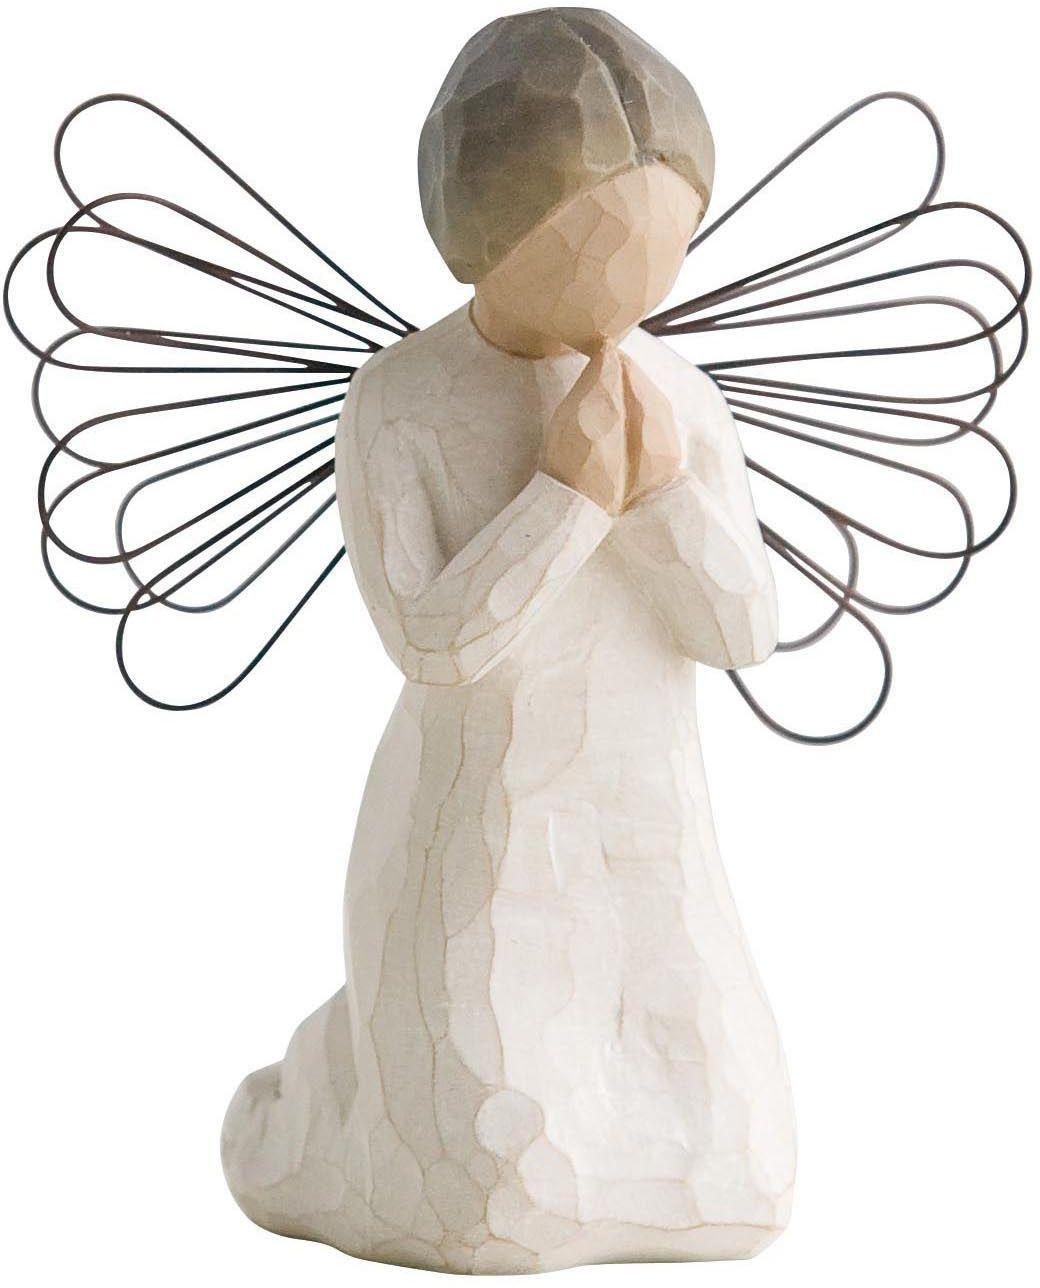 willow-tree-angel-of-prayer-figurine